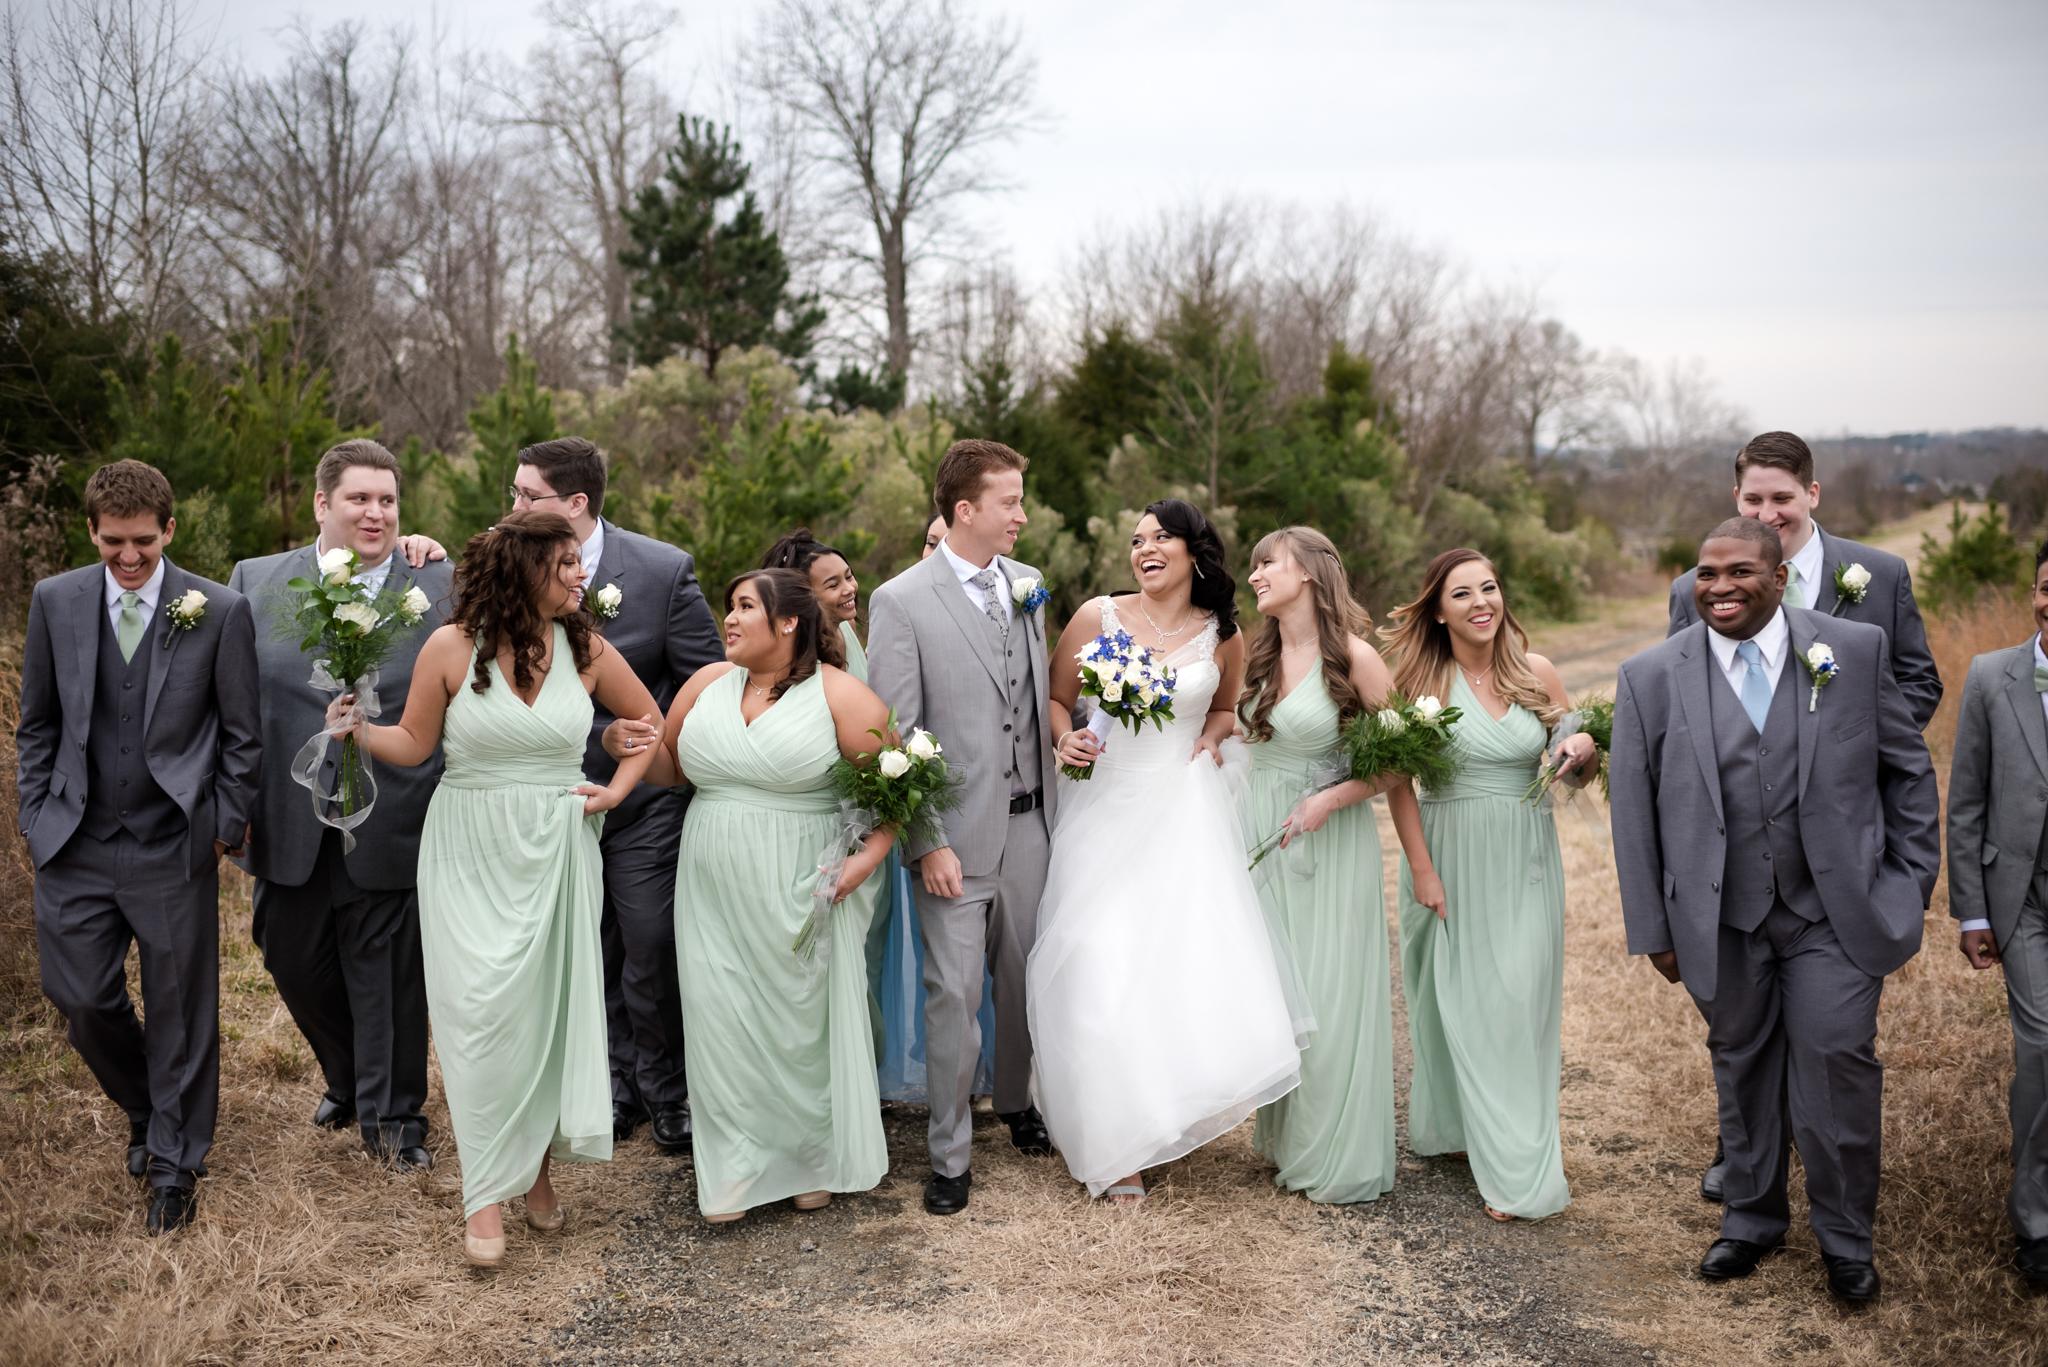 gibsonville-wedding-photography-015.jpg